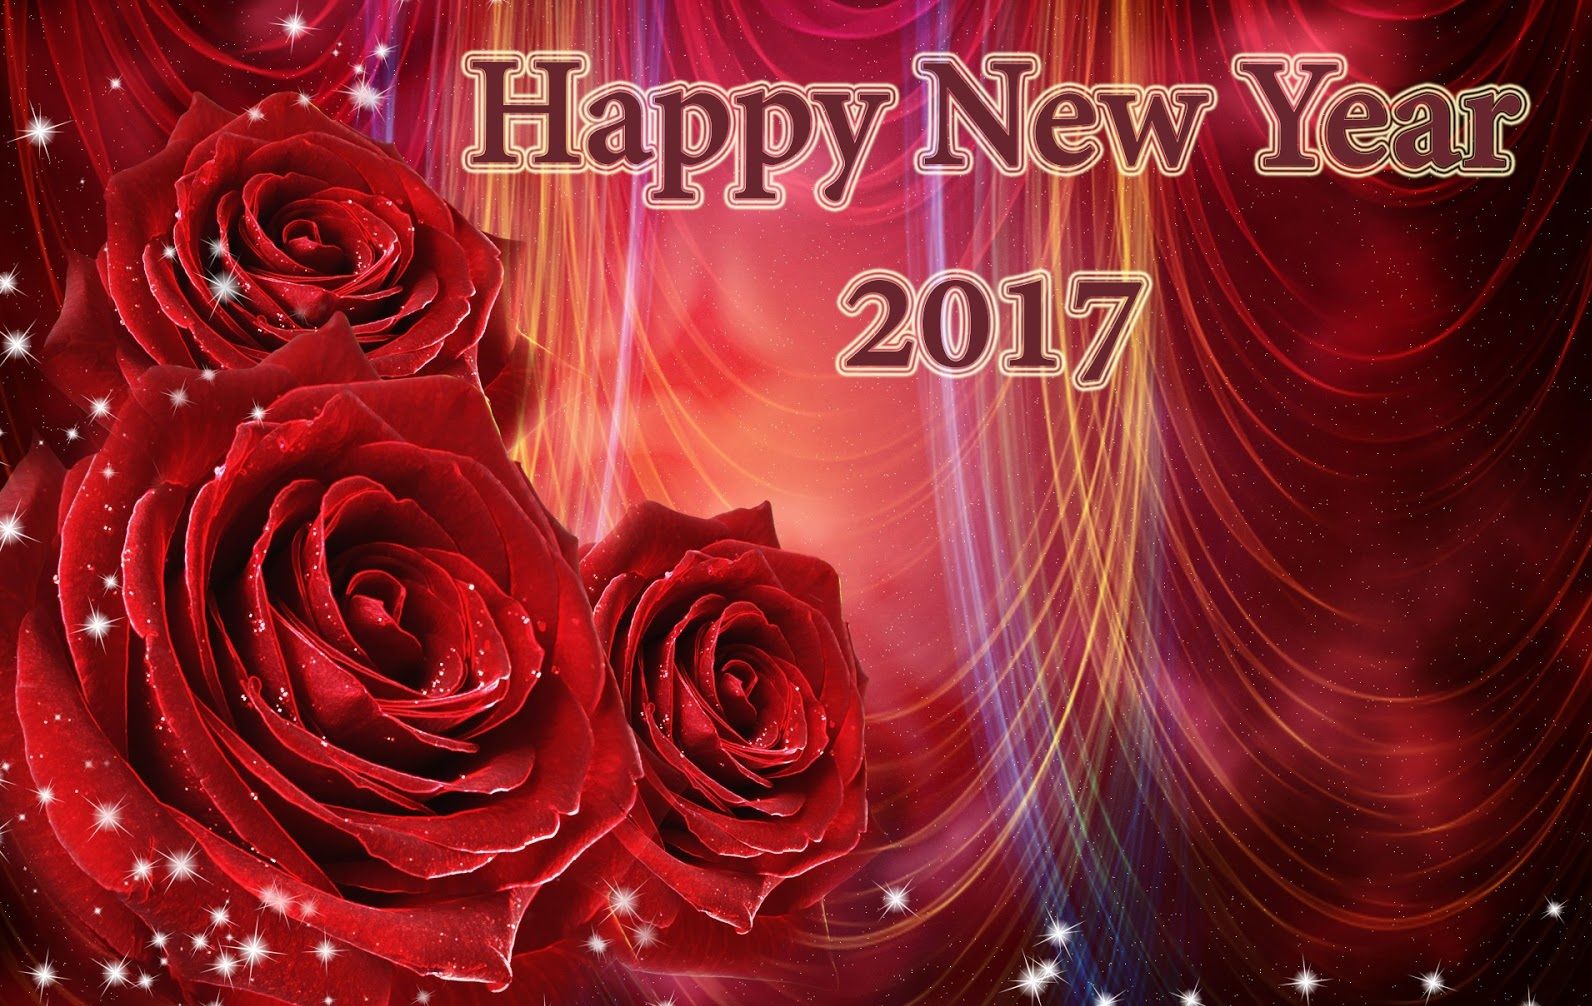 Happy-New-Year-2017-Wallpaper-HD.